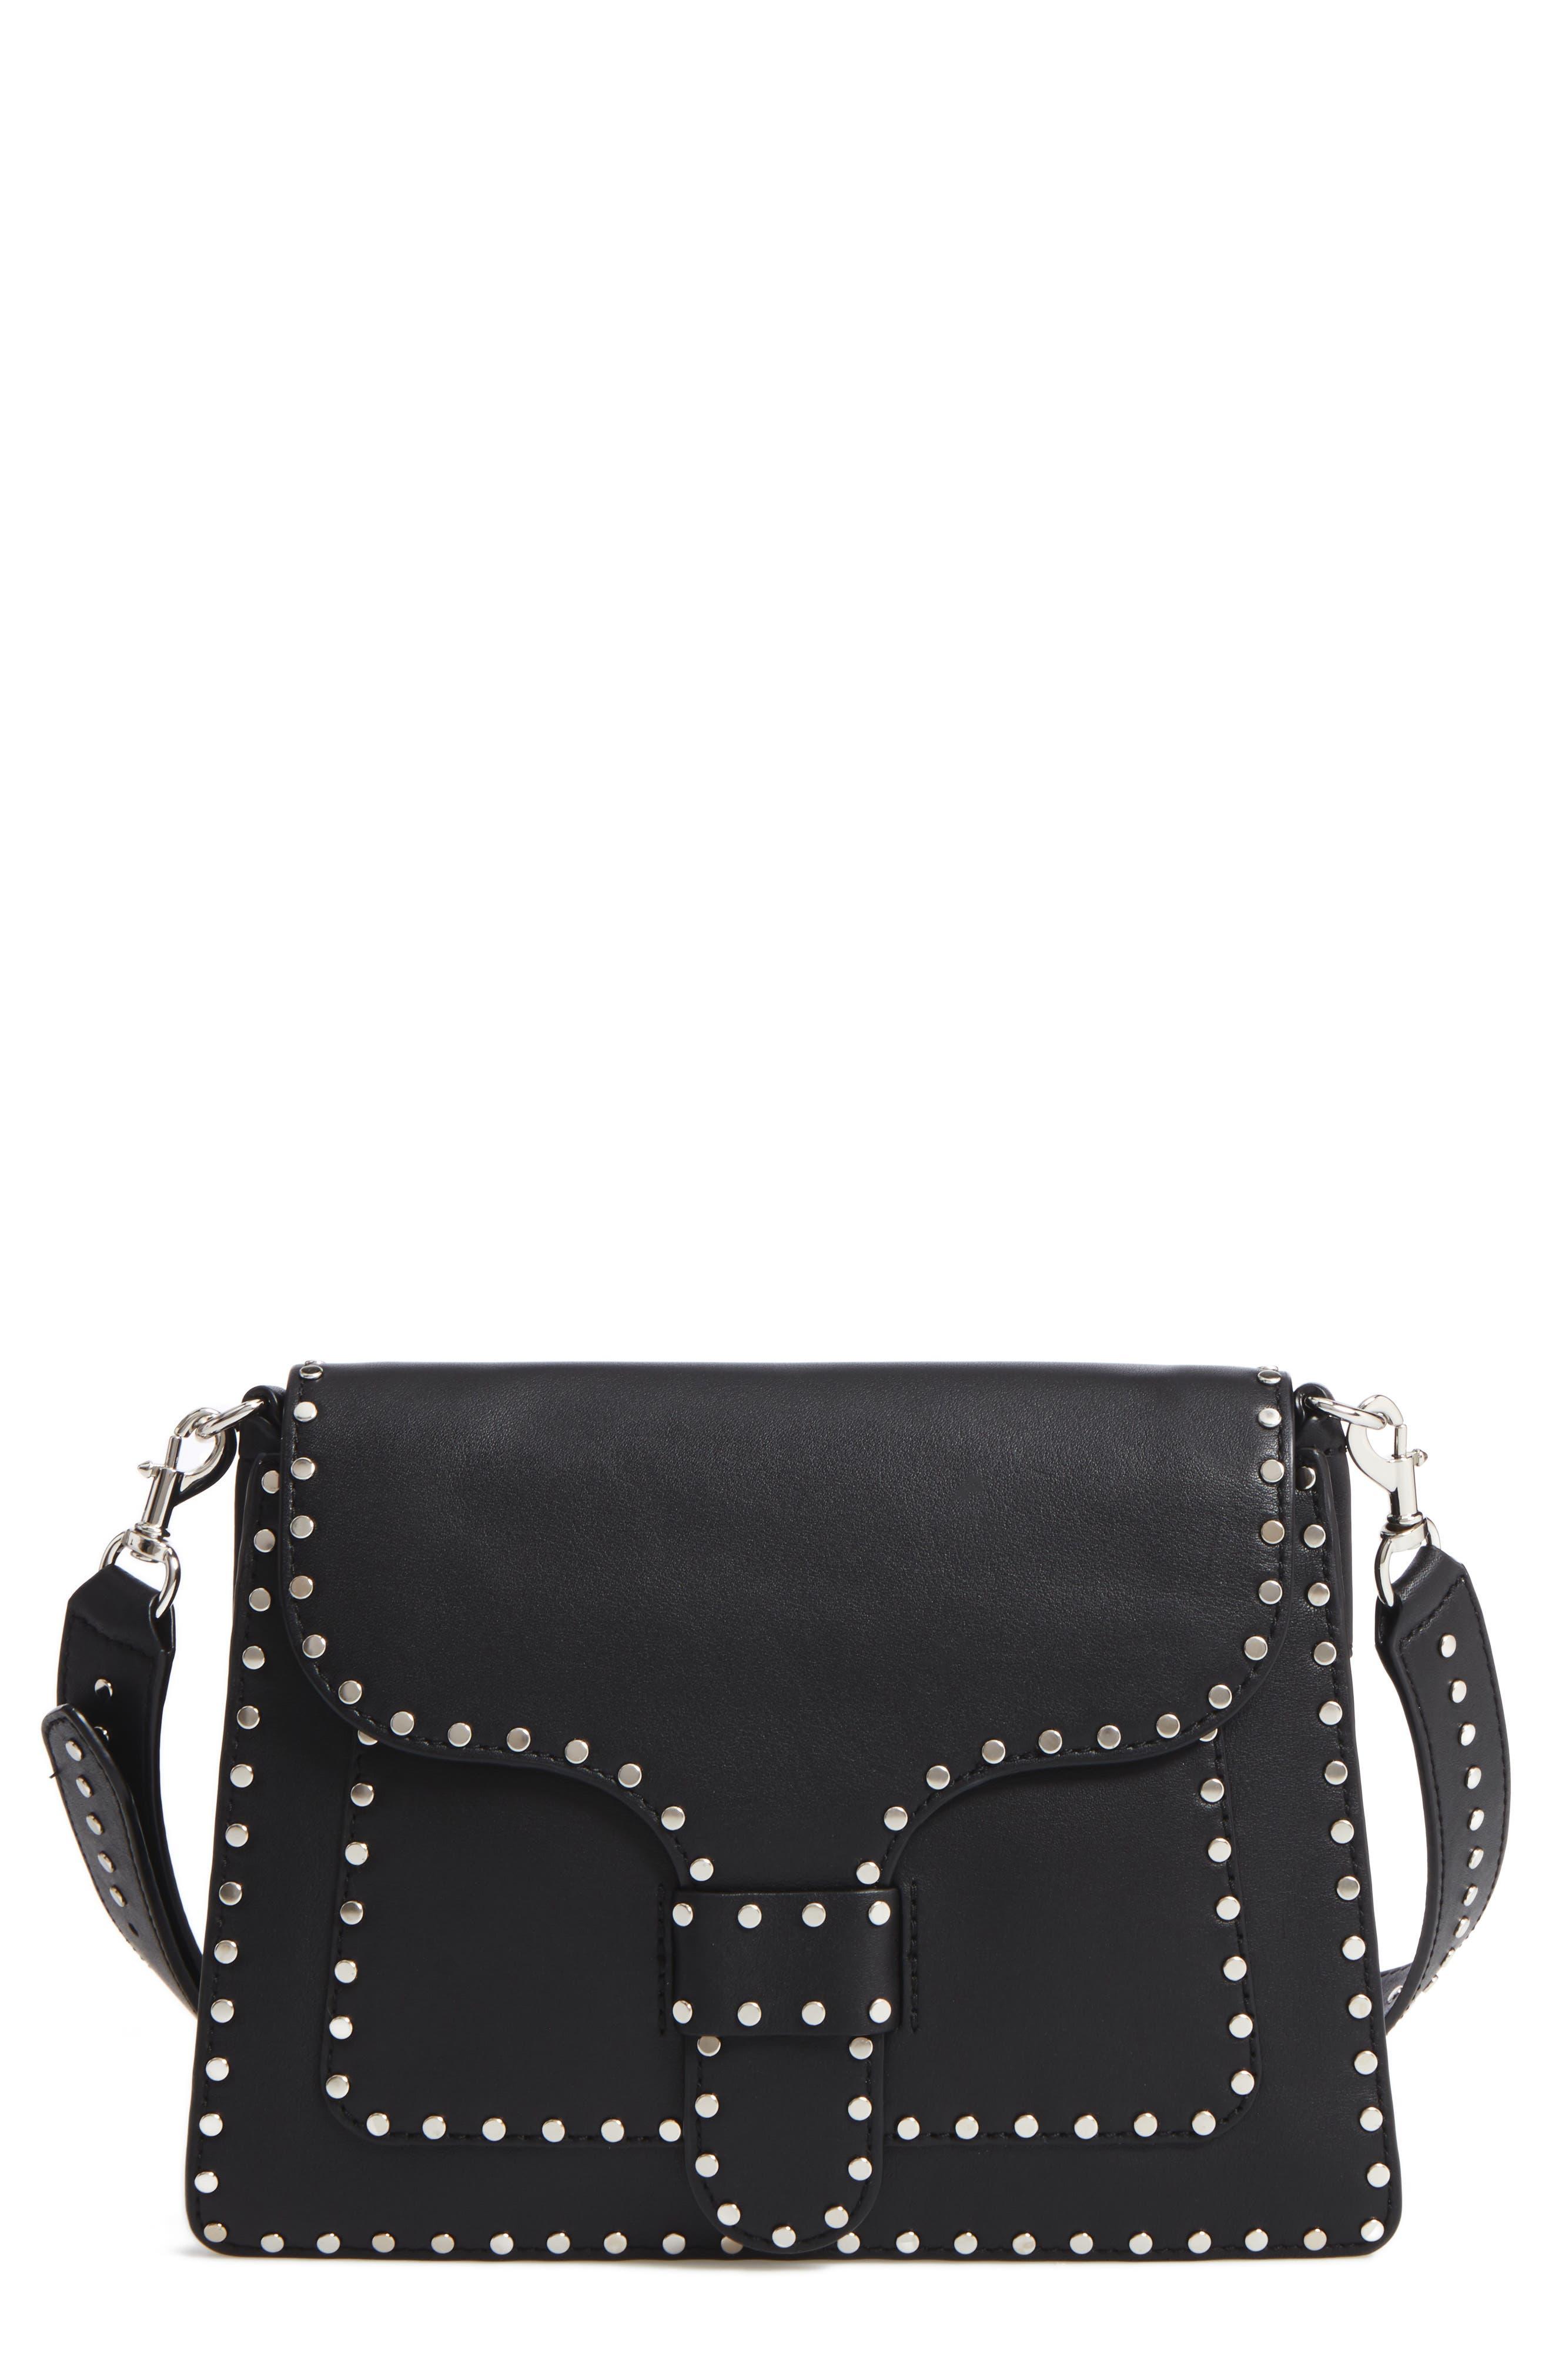 REBECCA MINKOFF Slim Midnighter Leather Crossbody Bag